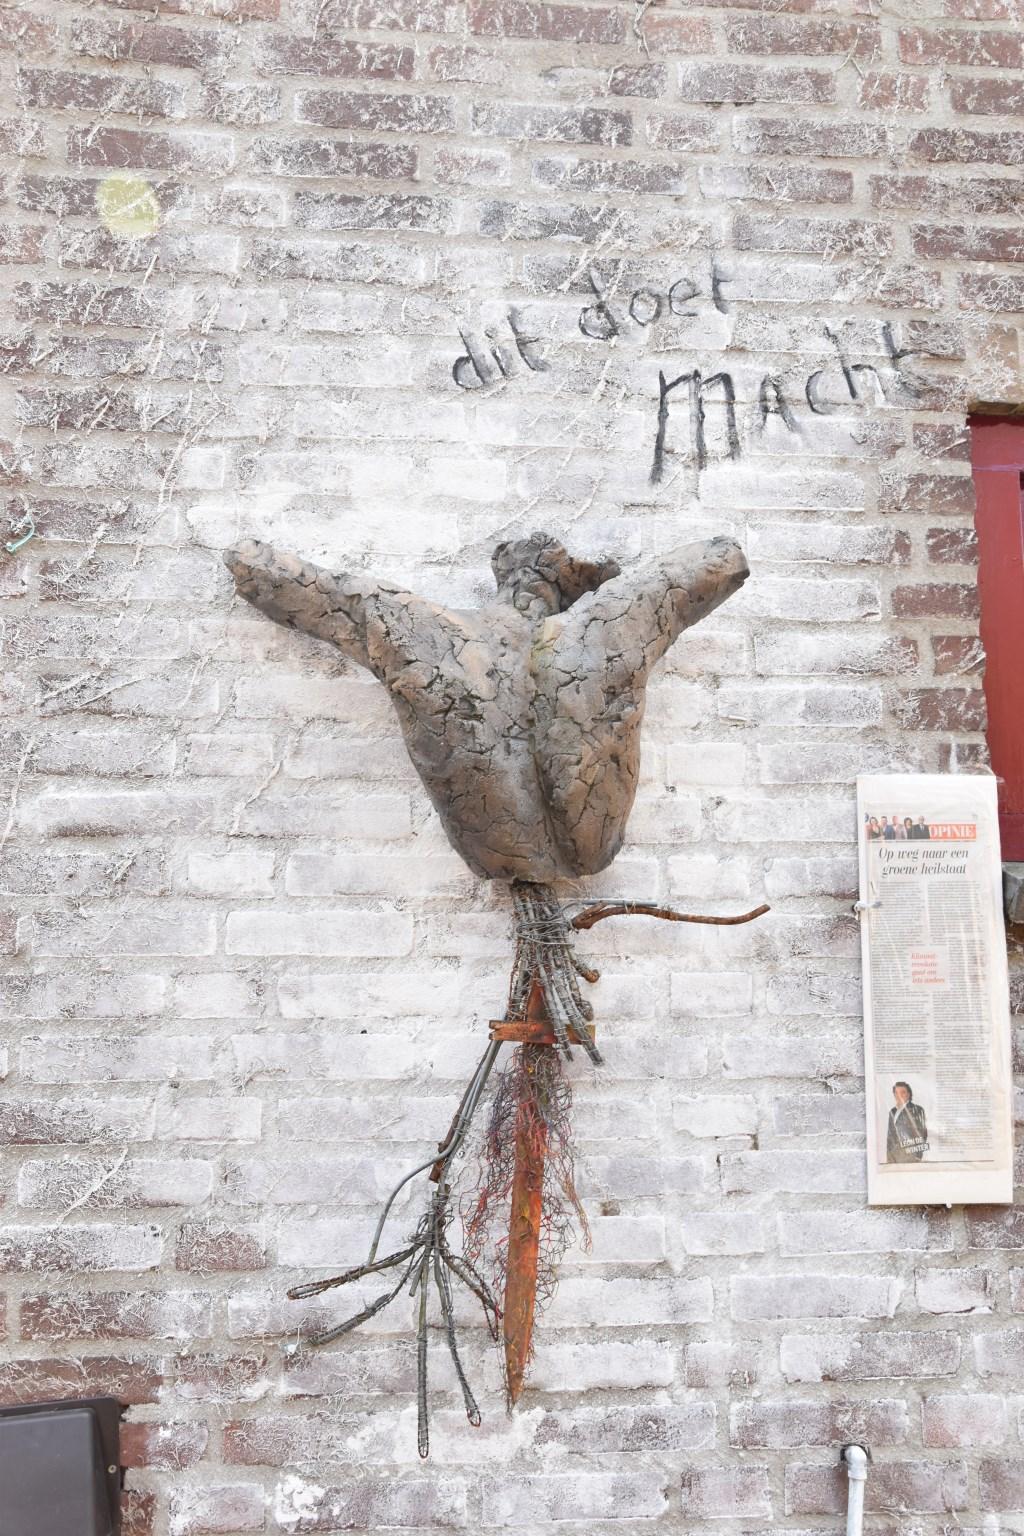 Werk van Thea Blok Foto: Marie-Christine van Lieshout © deMooiLaarbeekkrant